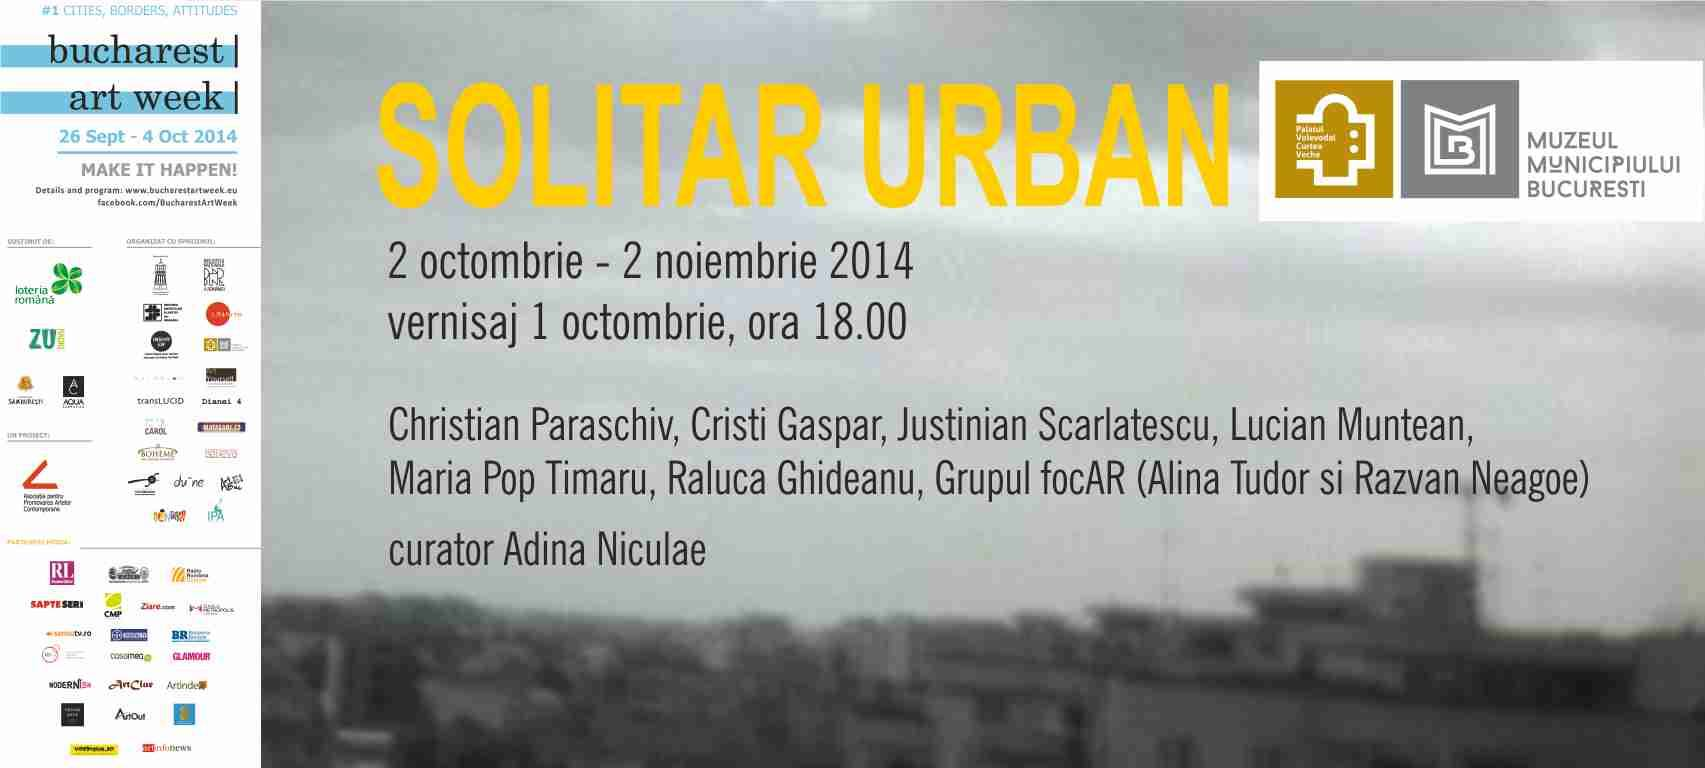 """Solitar Urban"" @ Muzeul Curtea Veche – Palatul Voievodal"